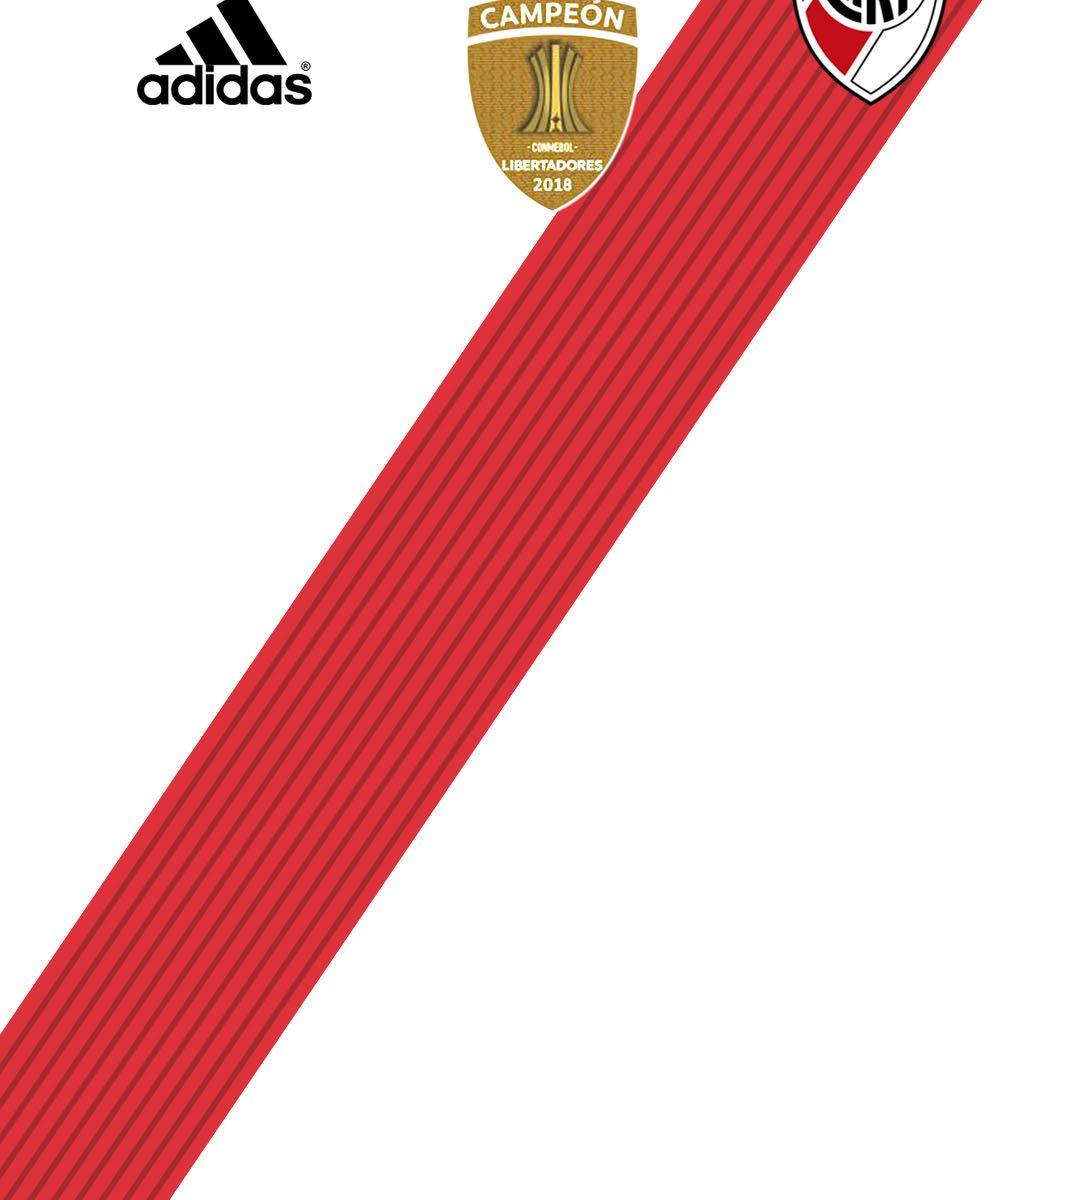 imagenes-de-river-plate-para-telefono-celular-fondos-de-pantalla-wallpaper-de-River-Camiseta River Plate Campeón Copa Libertadores 2018 - Parche Libertadores 2018